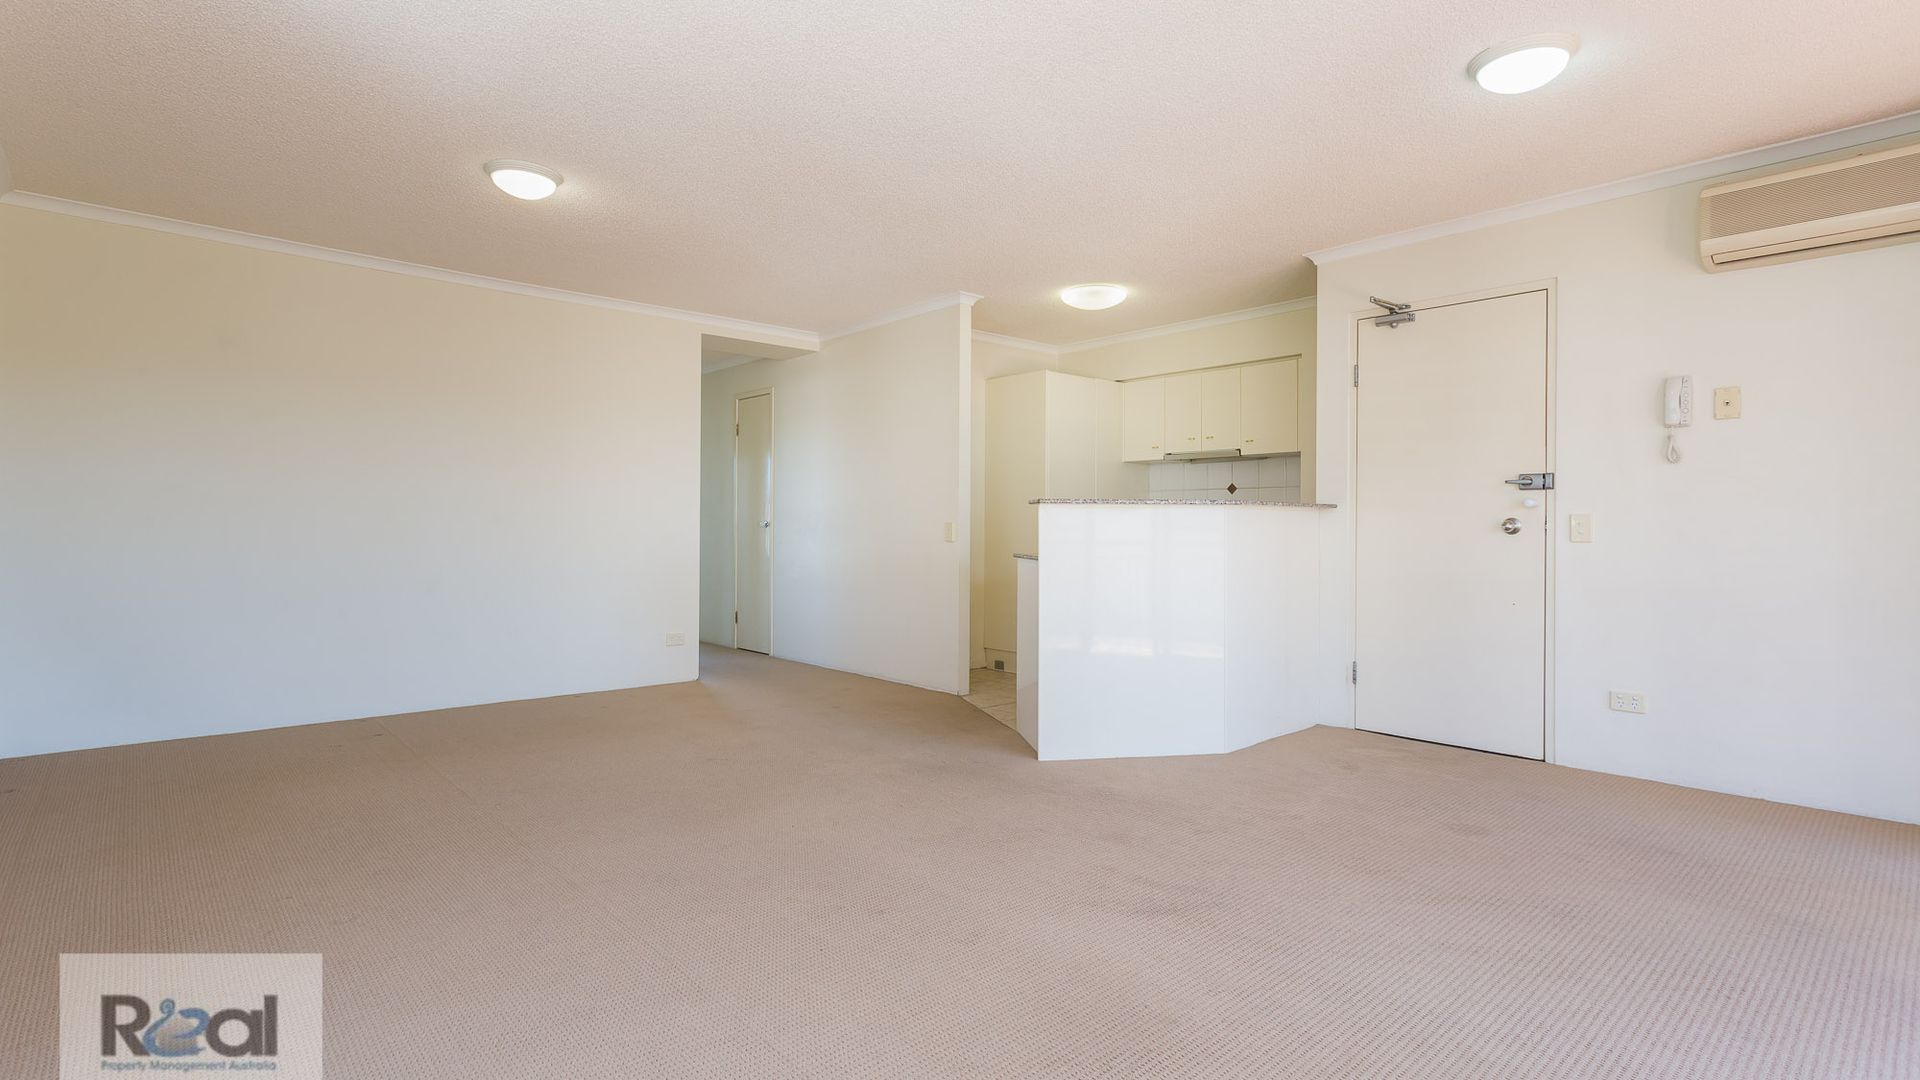 44 //45 55 Harries Road, Coorparoo QLD 4151, Image 2